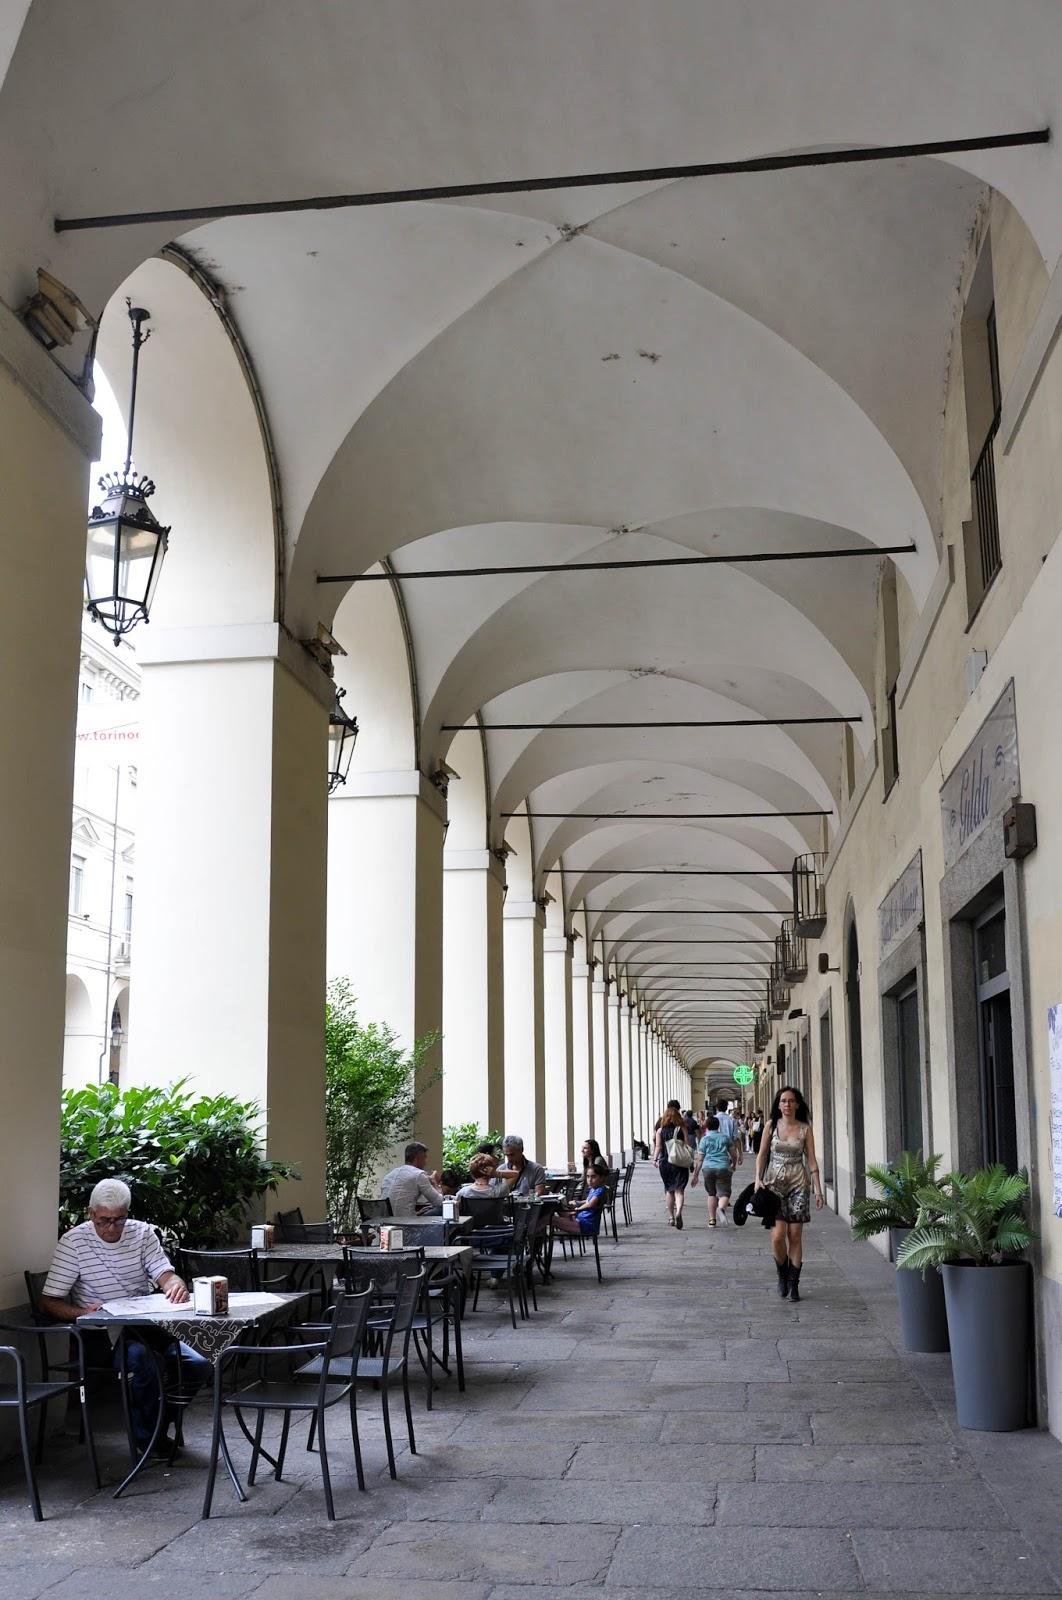 A street arcade, Turin, Italy